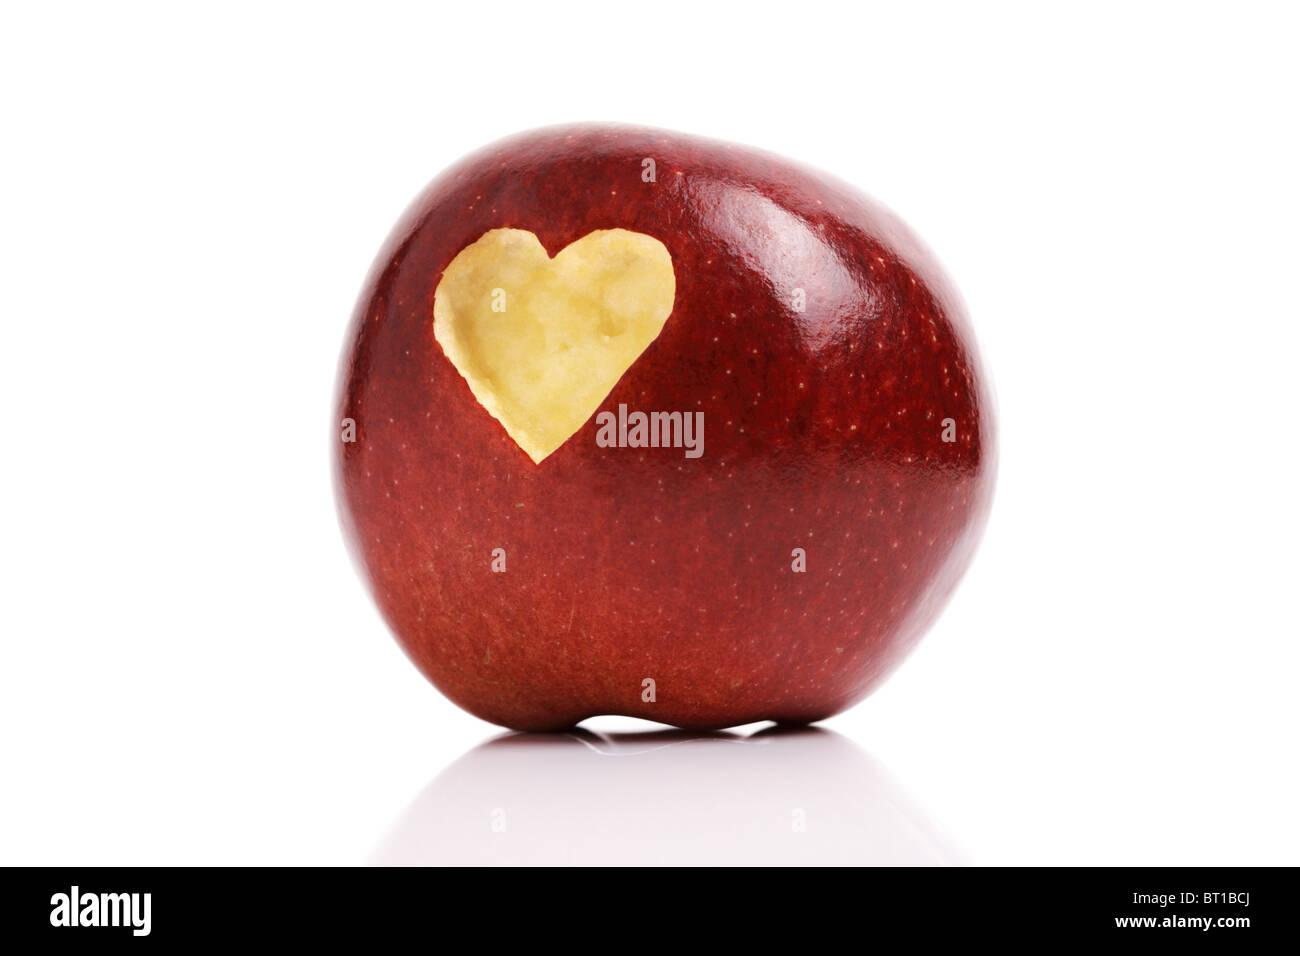 Roter Apfel mit Herz-symbol Stockbild